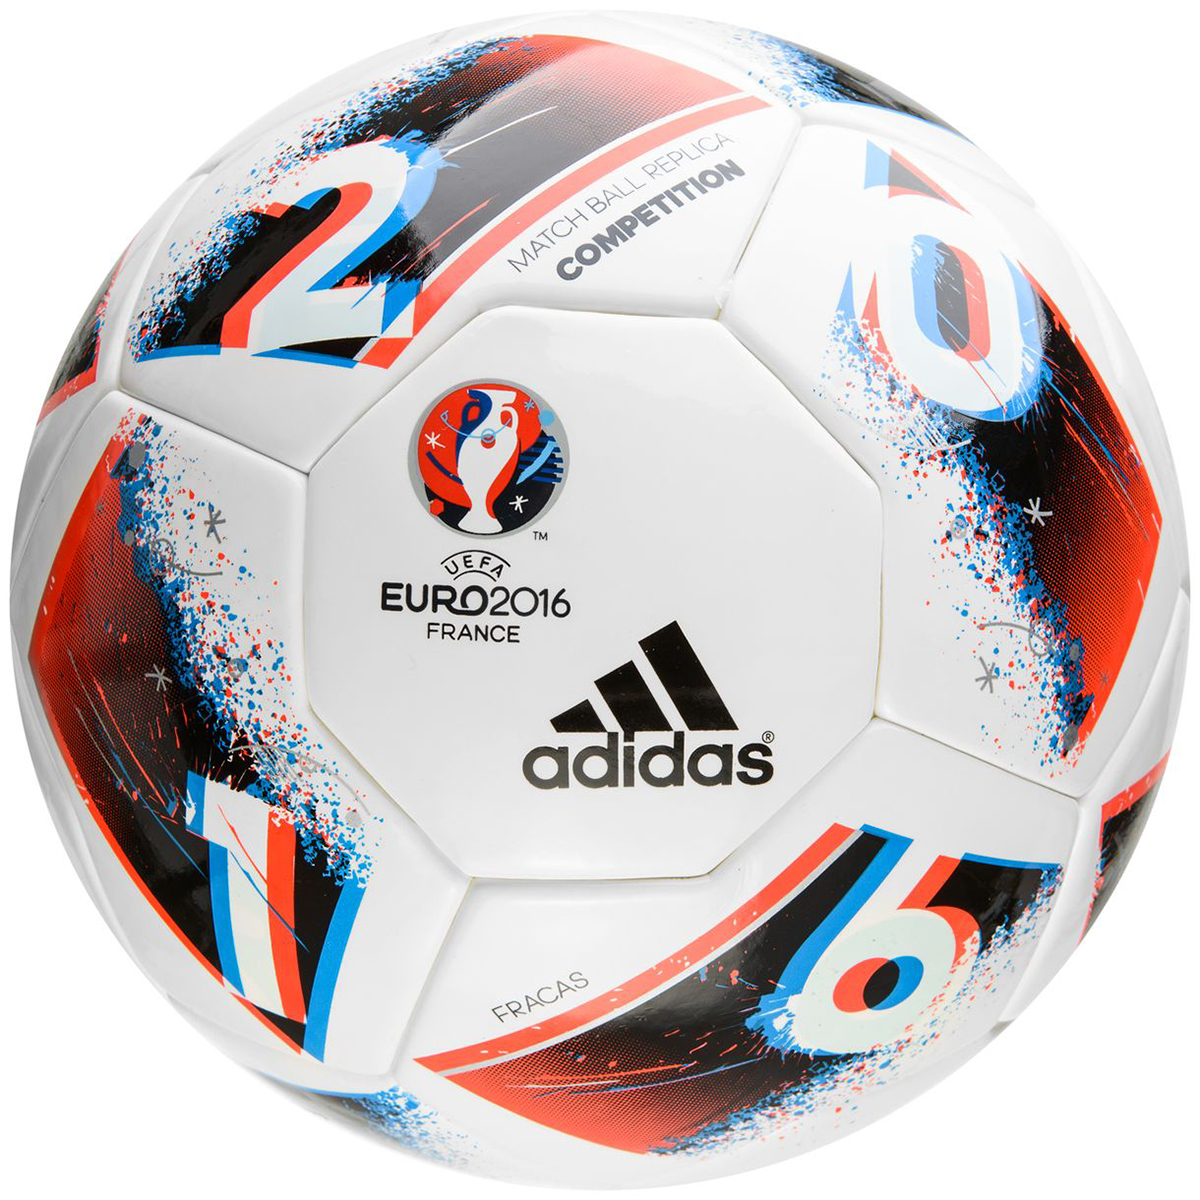 Super soccer stars coupon code 2018